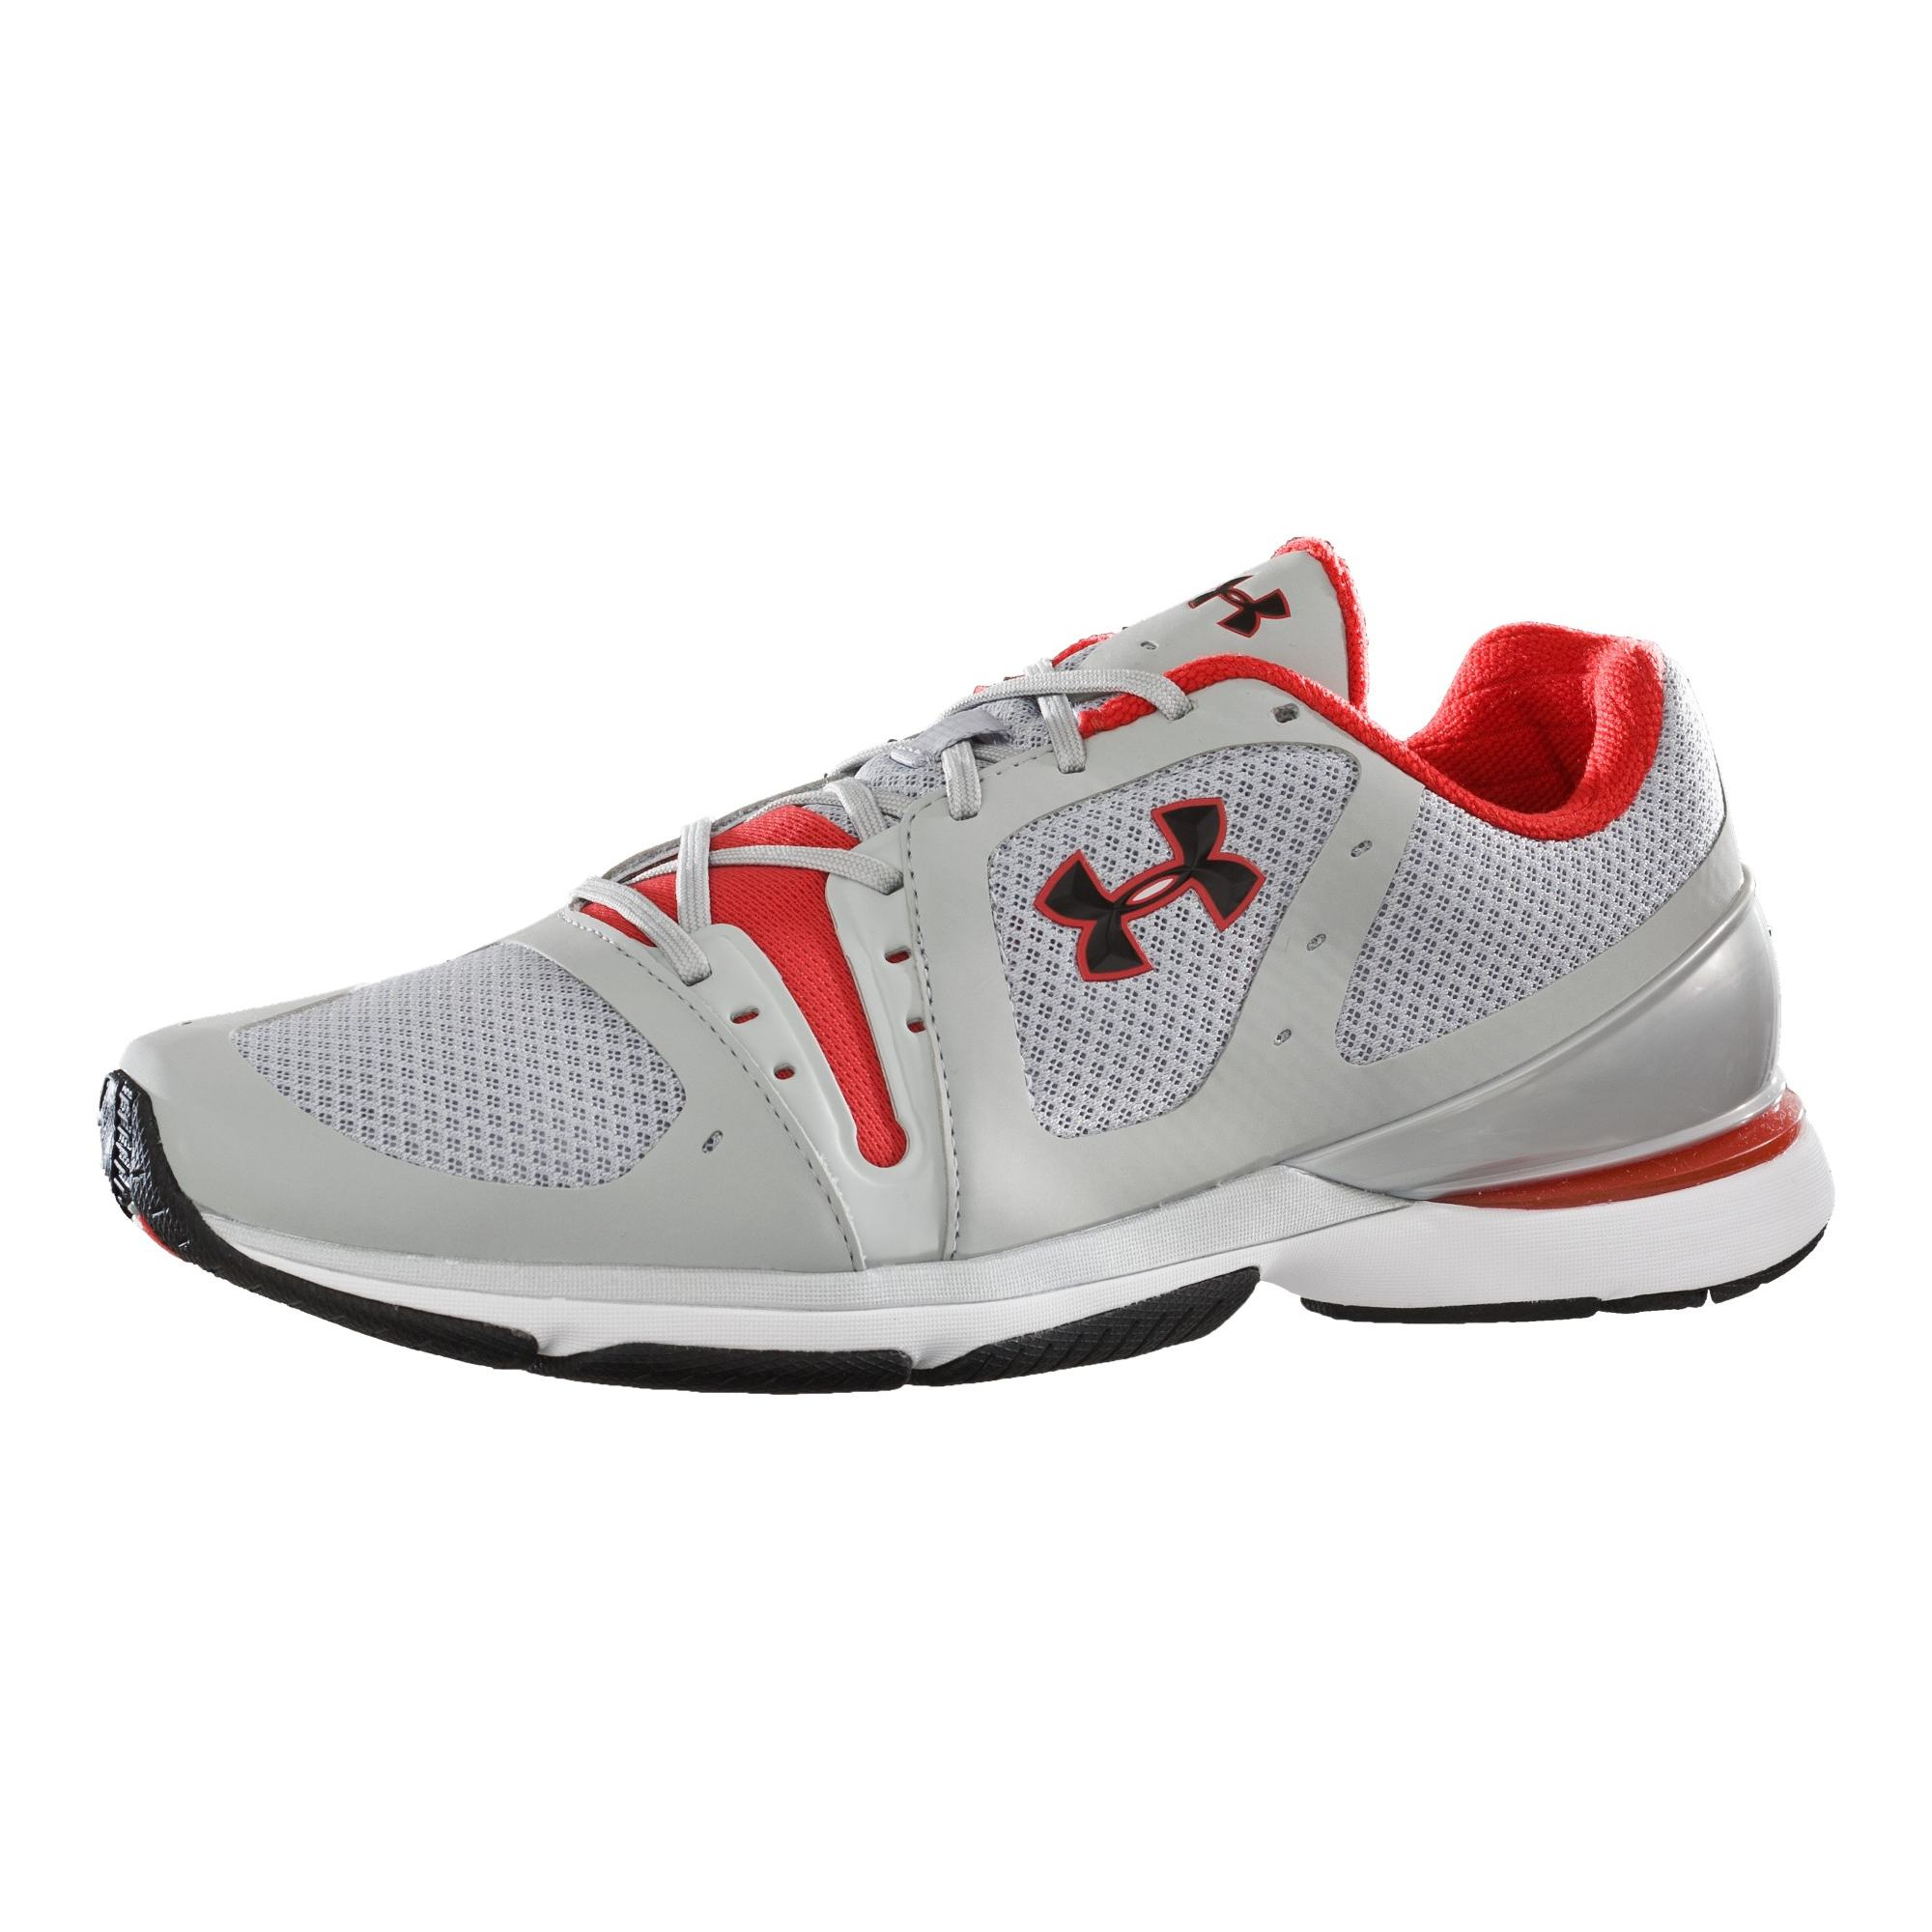 dc1177f4f2 Men's UA Incite Training Shoe » Mens » Under Armour Sports Clothing ...